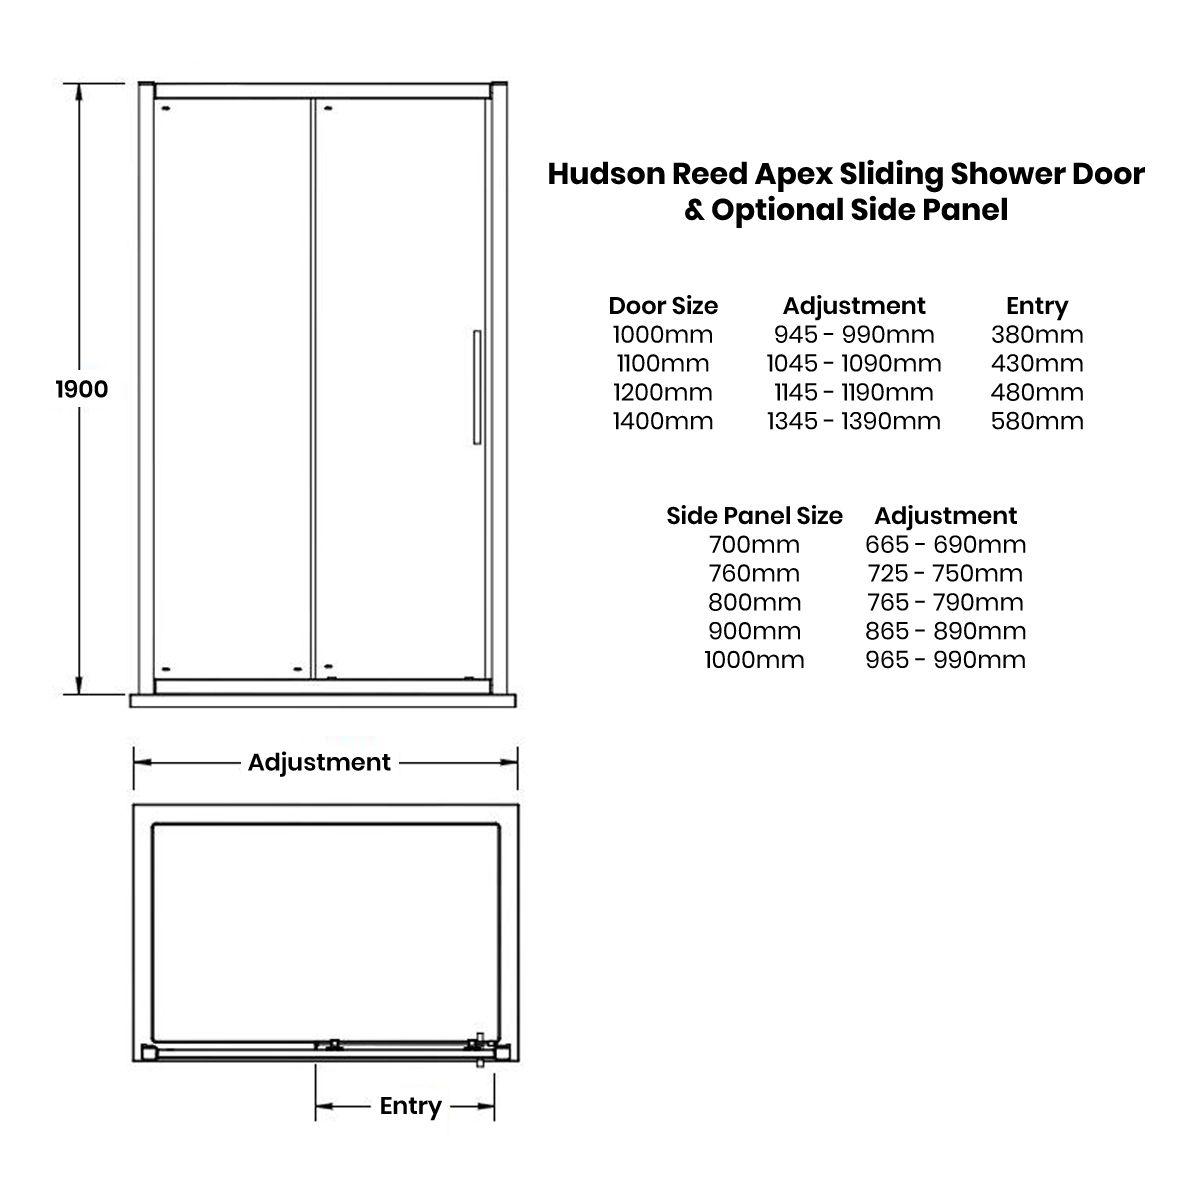 Hudson Reed Apex Sliding Shower Enclosure Dimensions